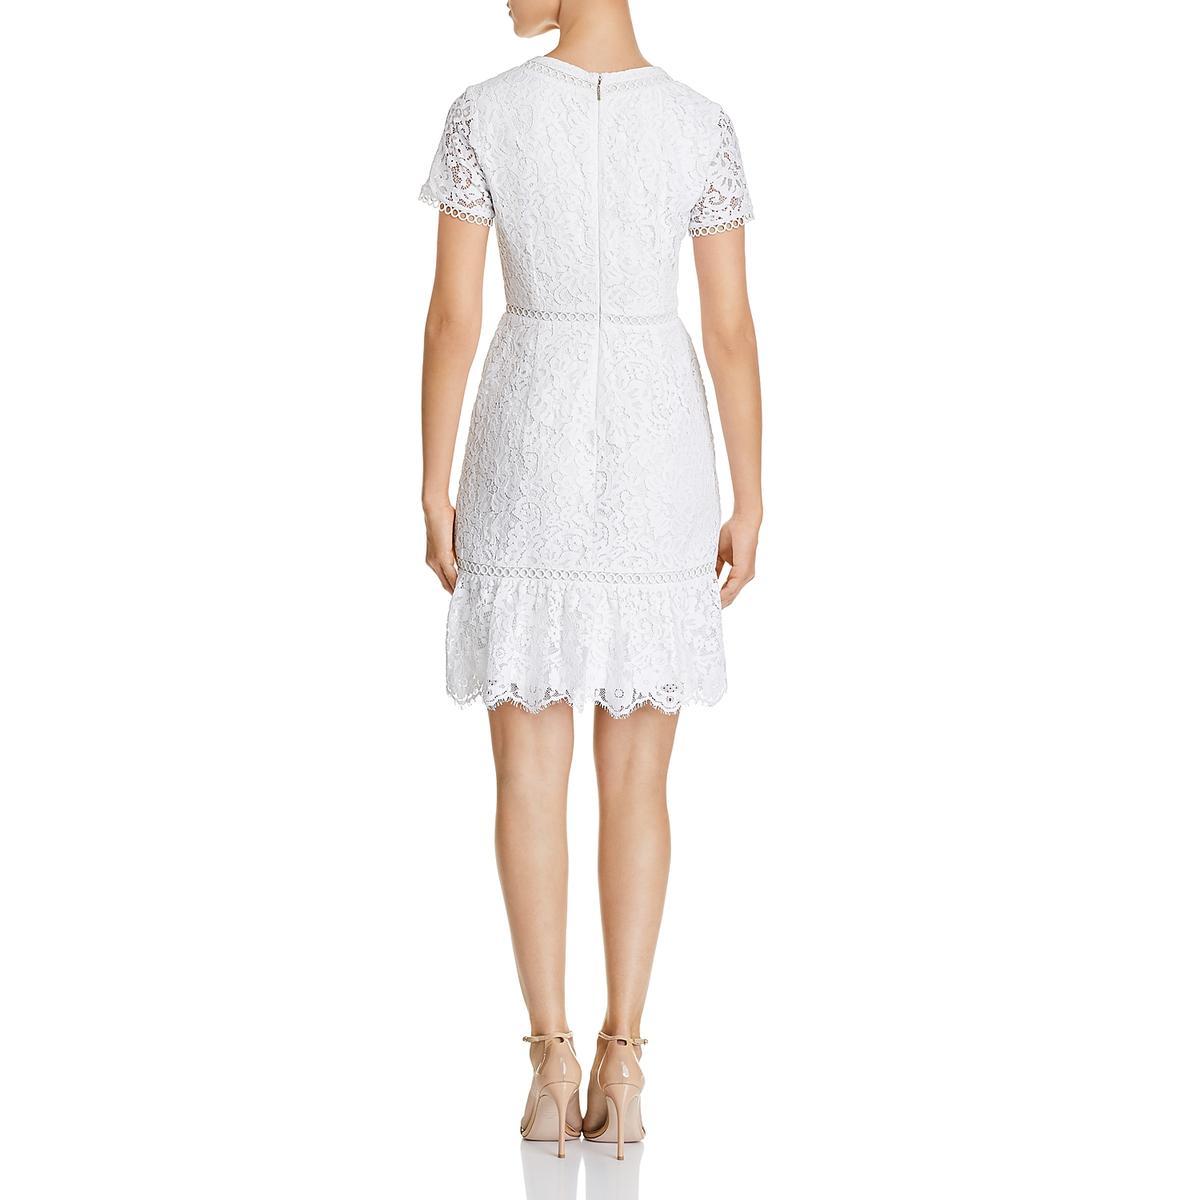 Karl Lagerfeld Paris Womens Lace V-Neck Party Midi Dress BHFO 3871